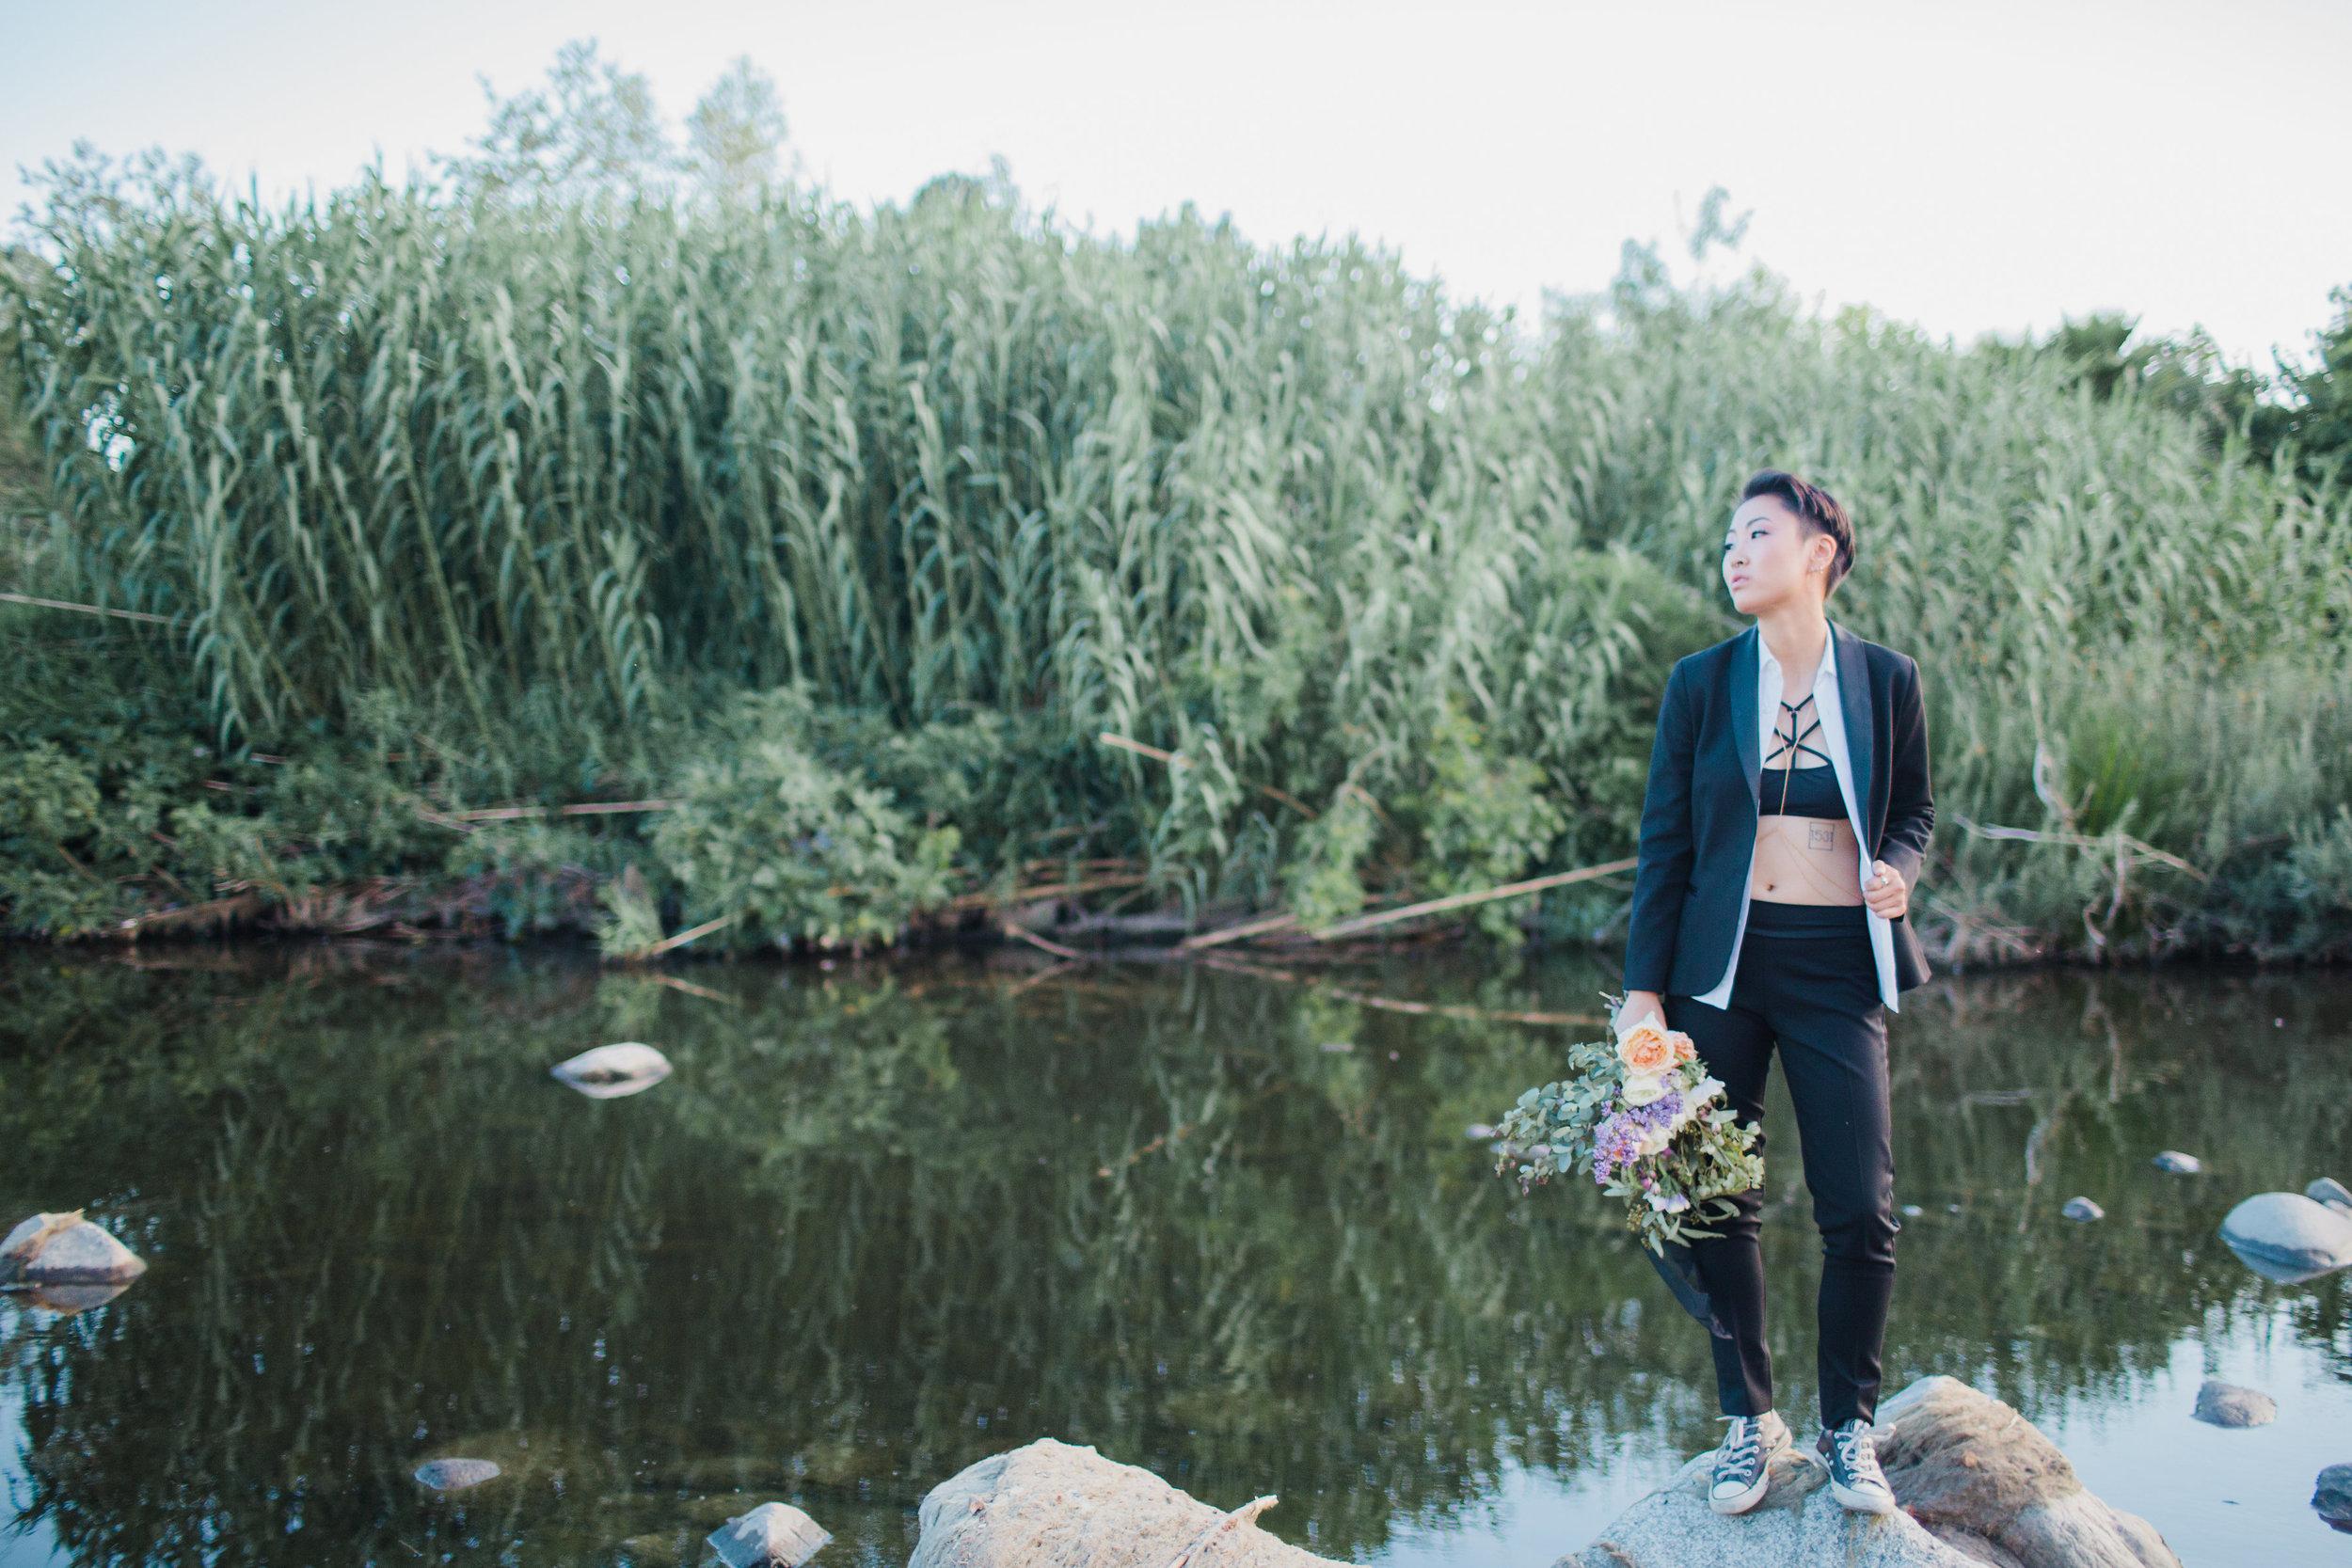 gay bride at the la river #lrqcfloral #bridestobe